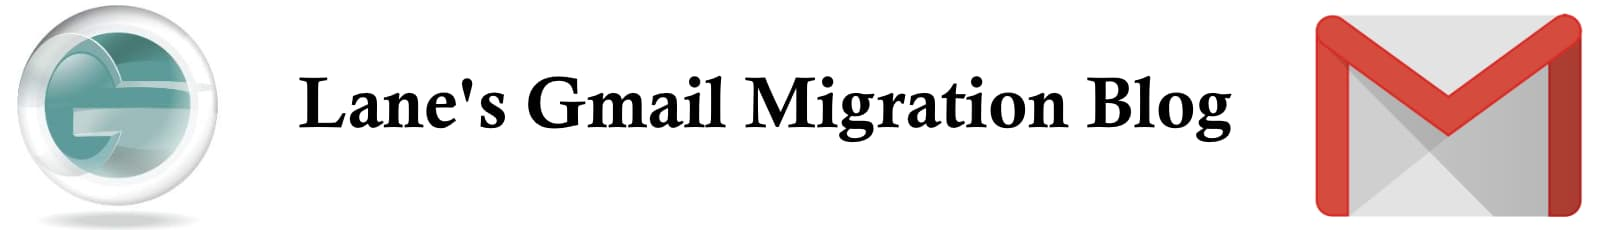 Gmail Migration Blog